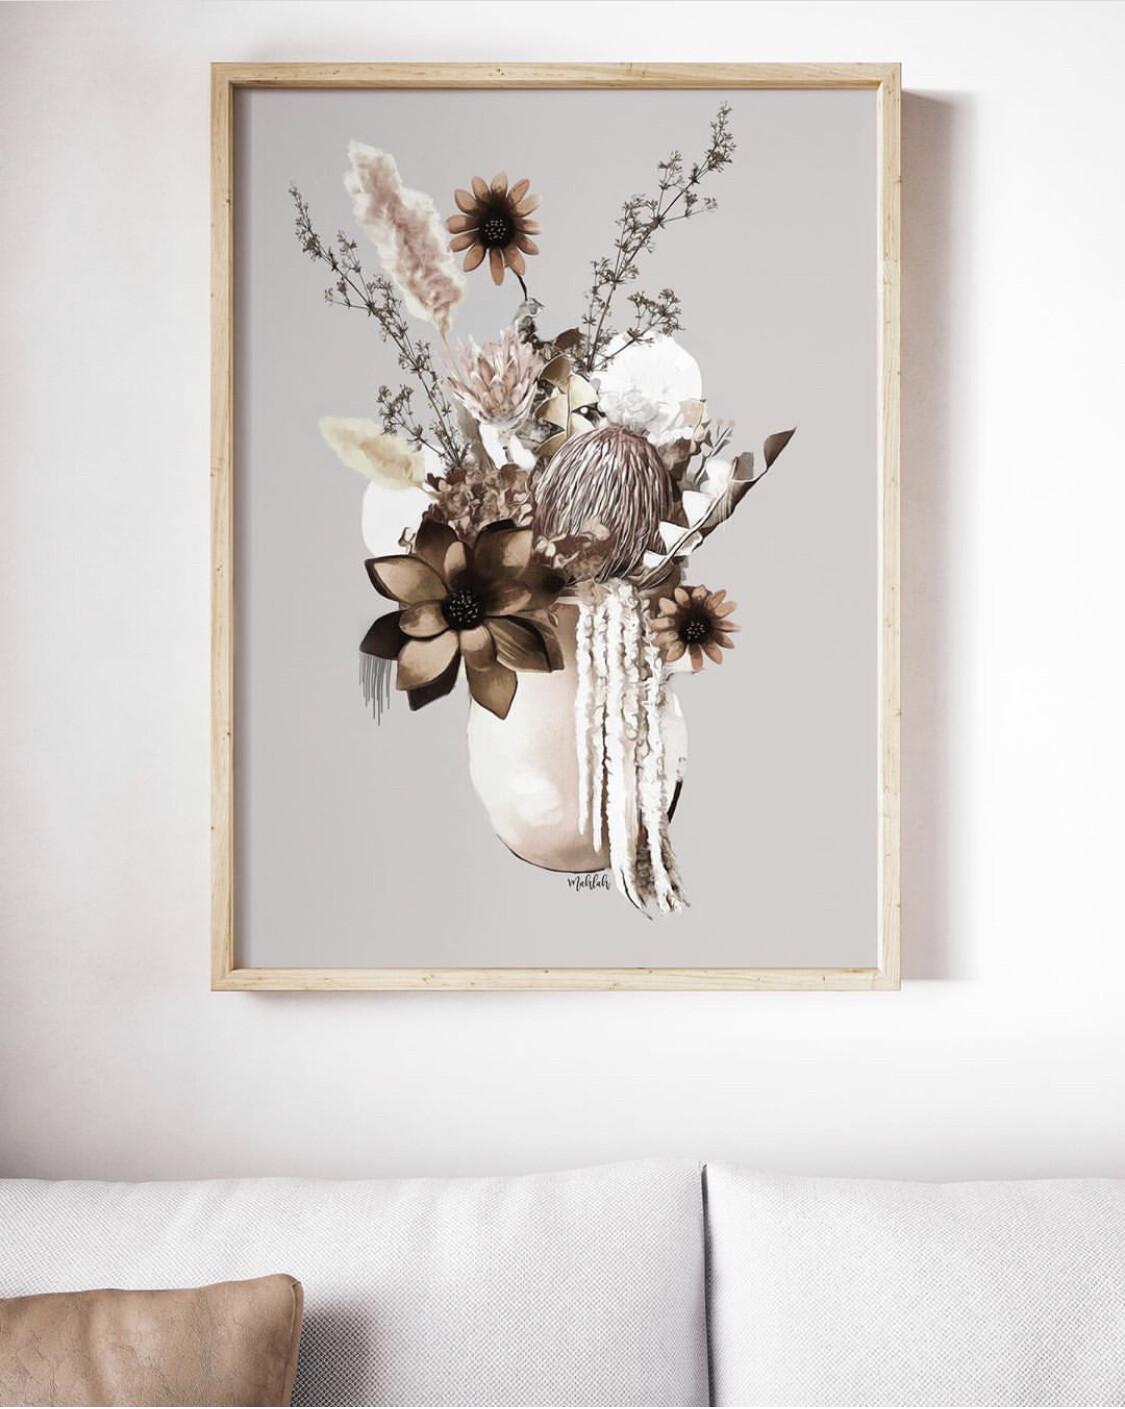 The Natural Flower Vase Print